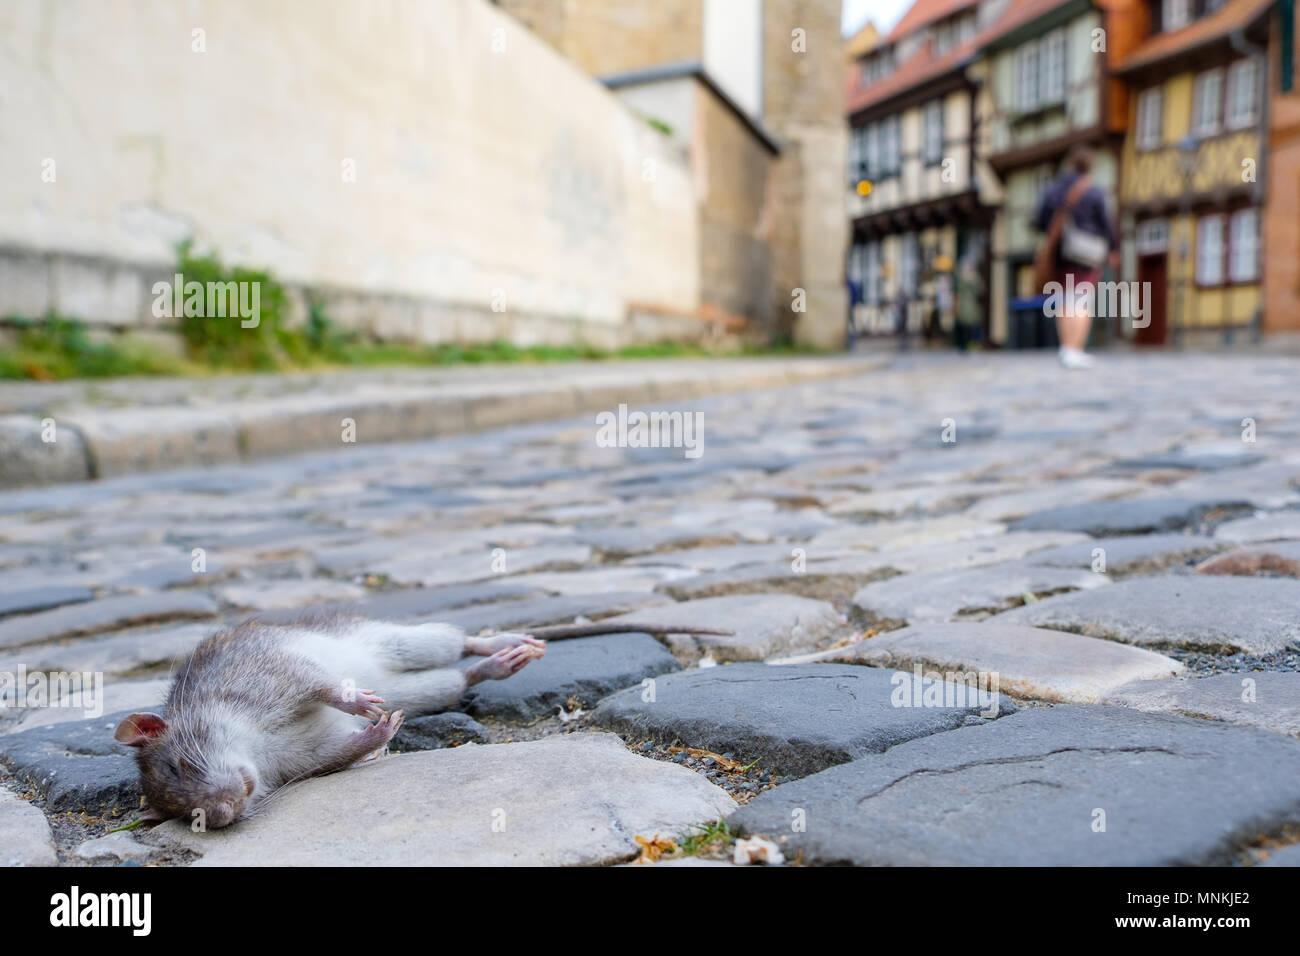 historische Altstadt von Quedlinburg Harz Stock Photo